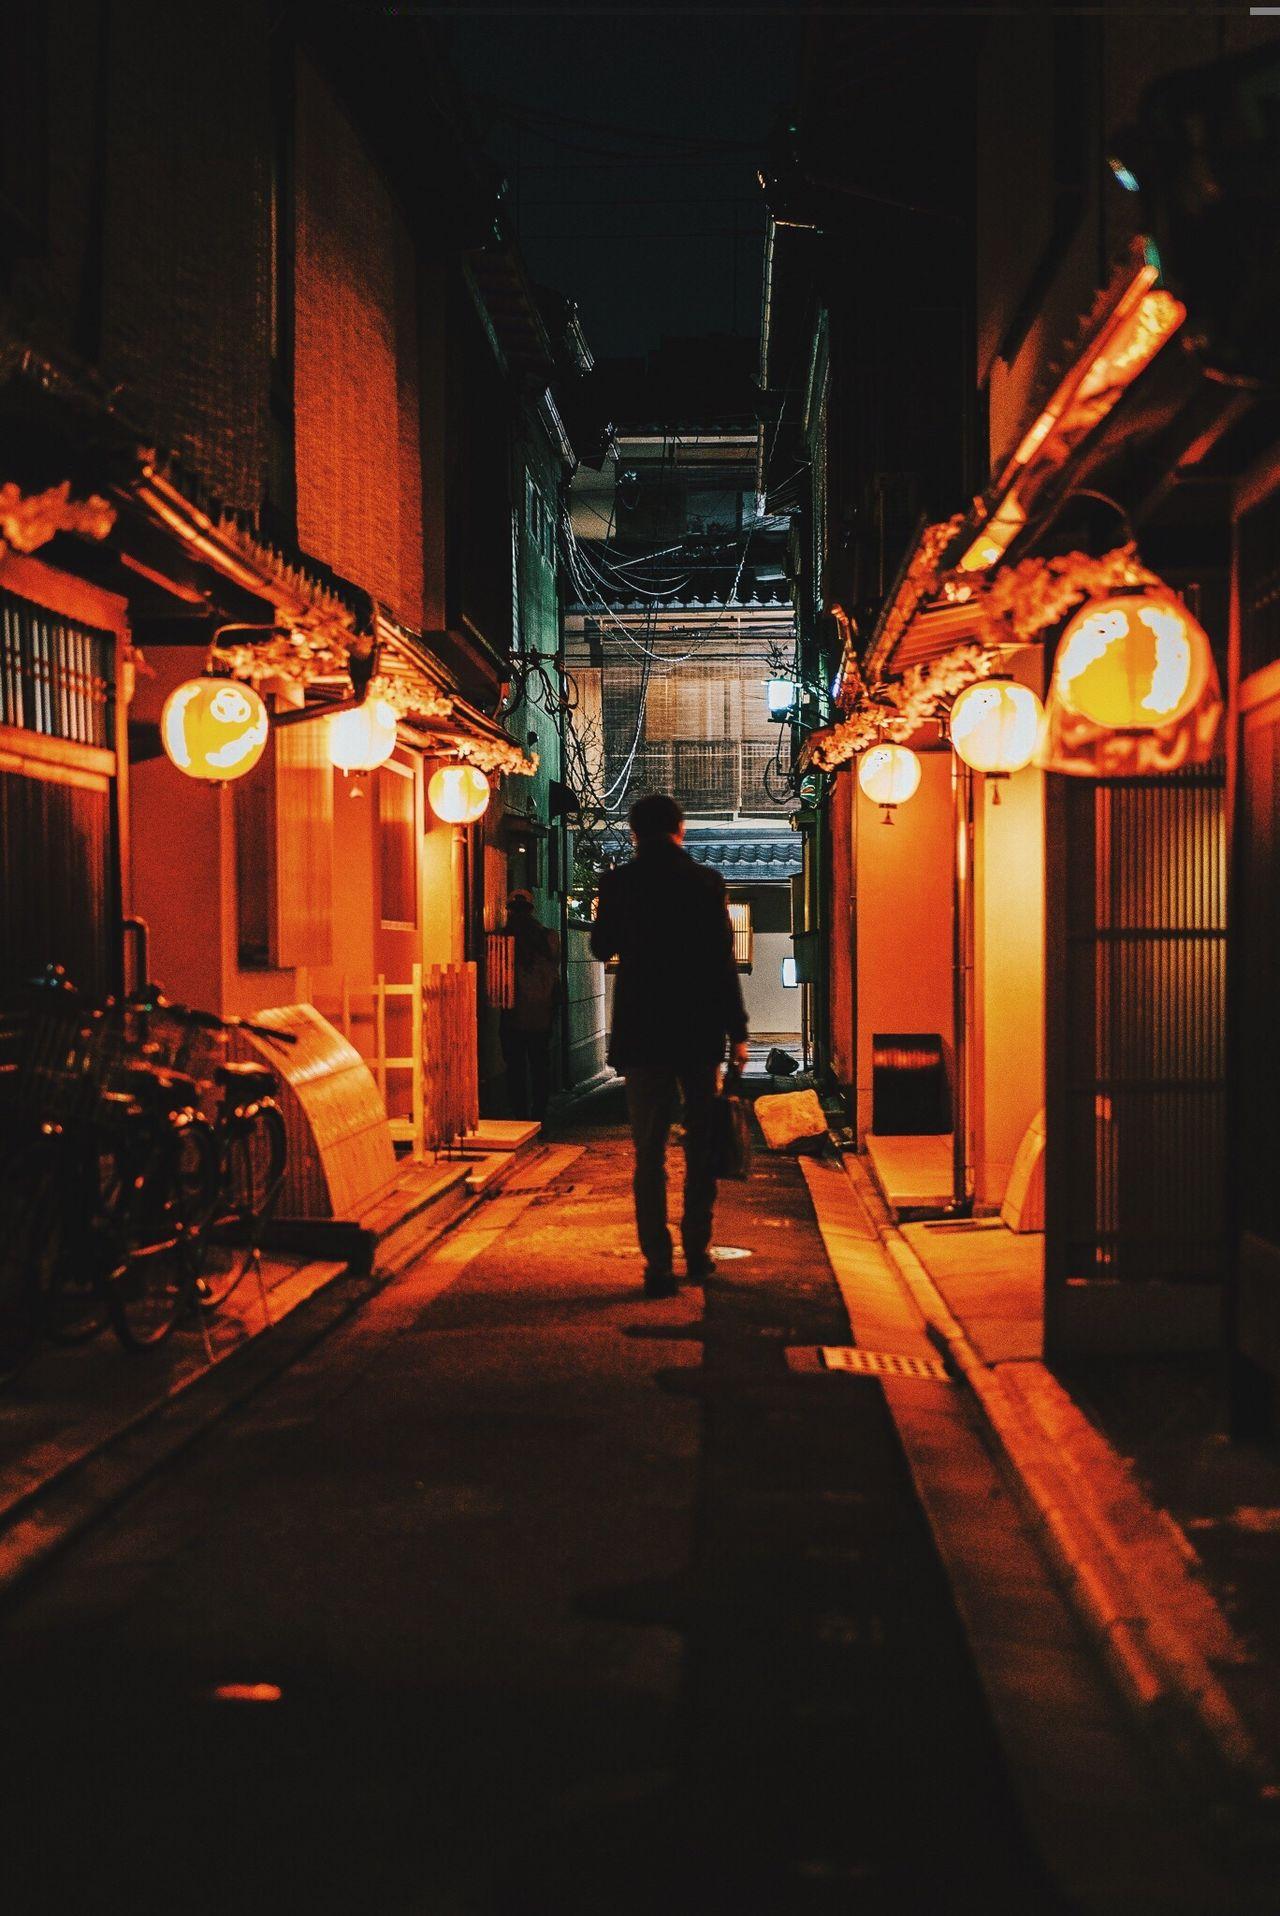 Kyoto, Japan 2017 Illuminated Rear View One Person Men Kyoto, Japan Lanterns Traditional